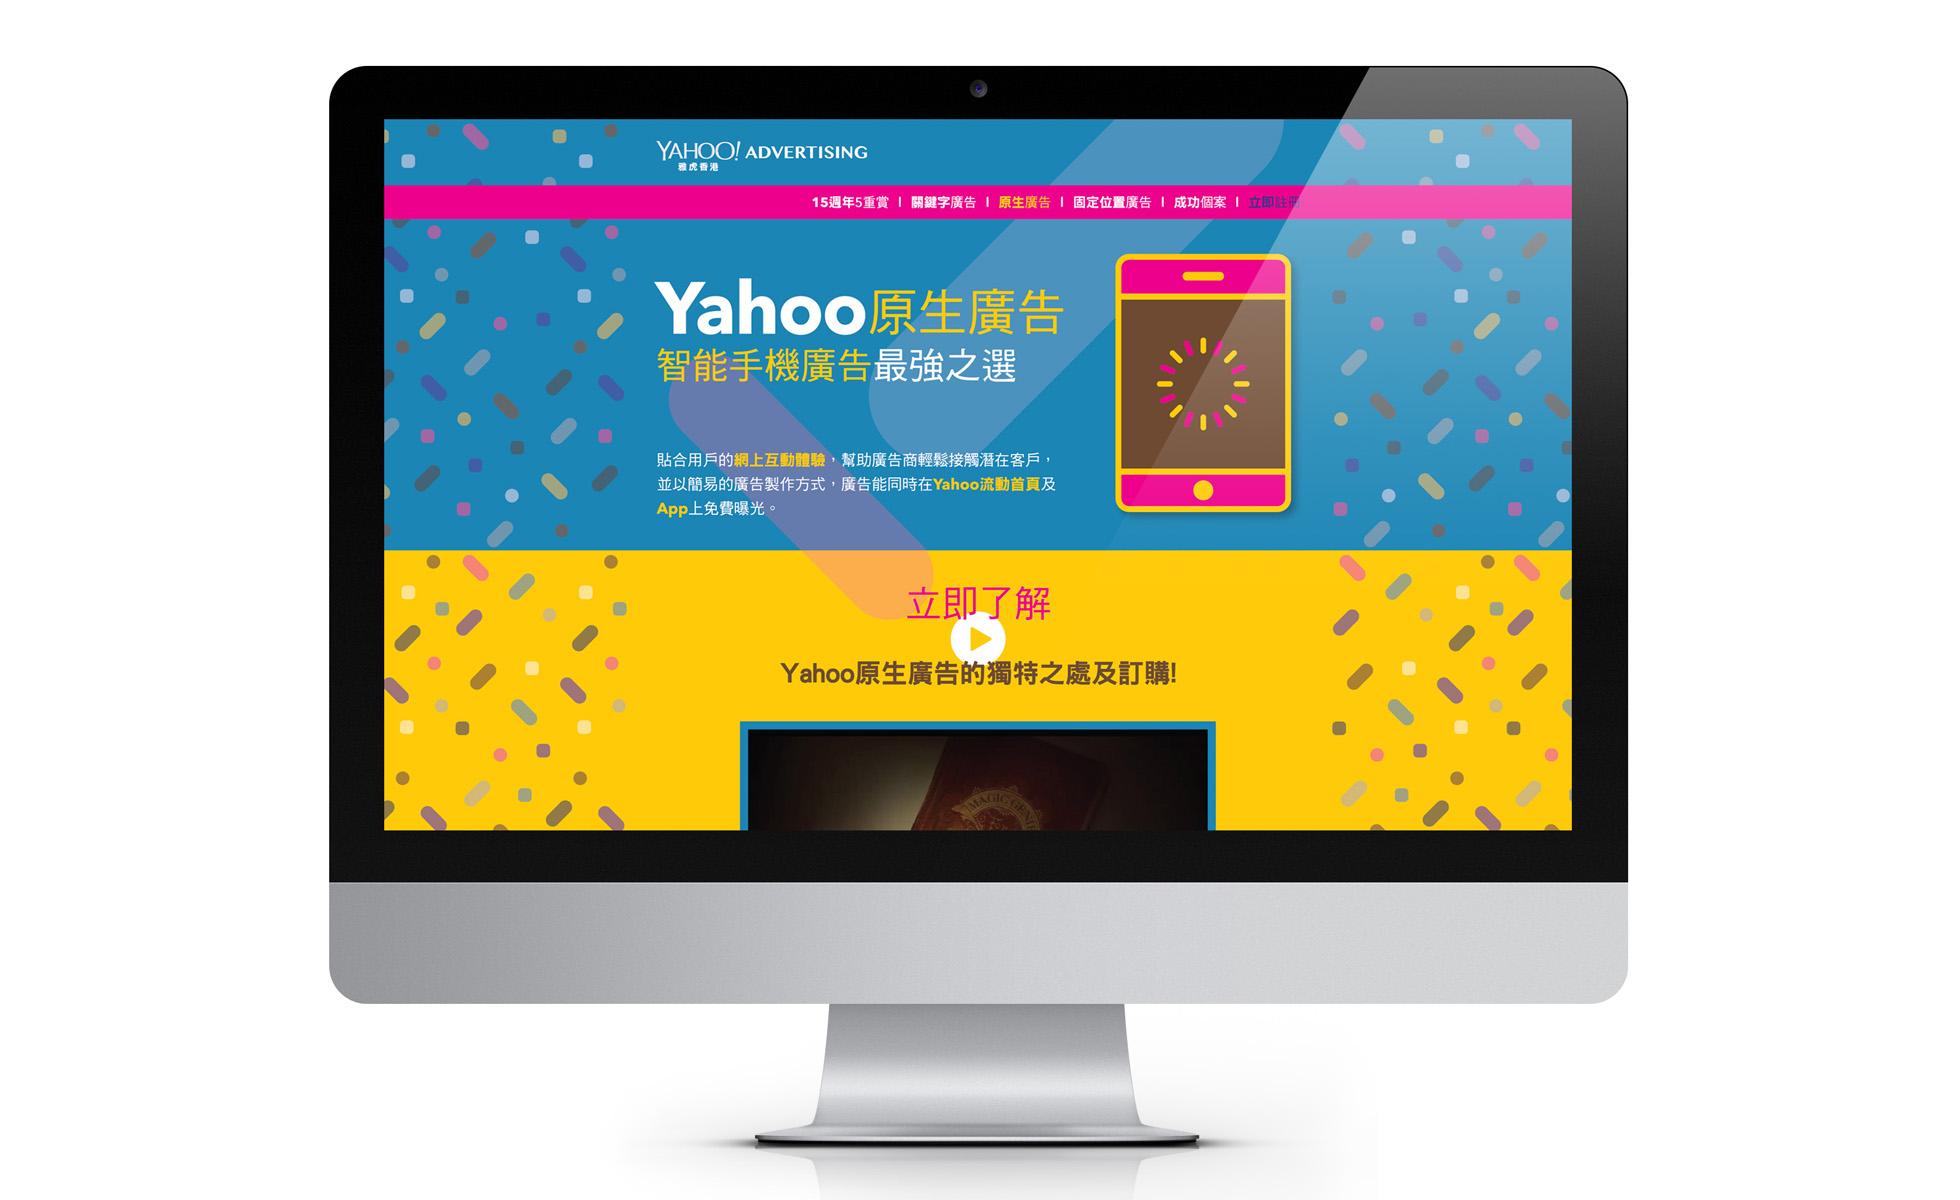 Yahoo_iMac-2.jpg